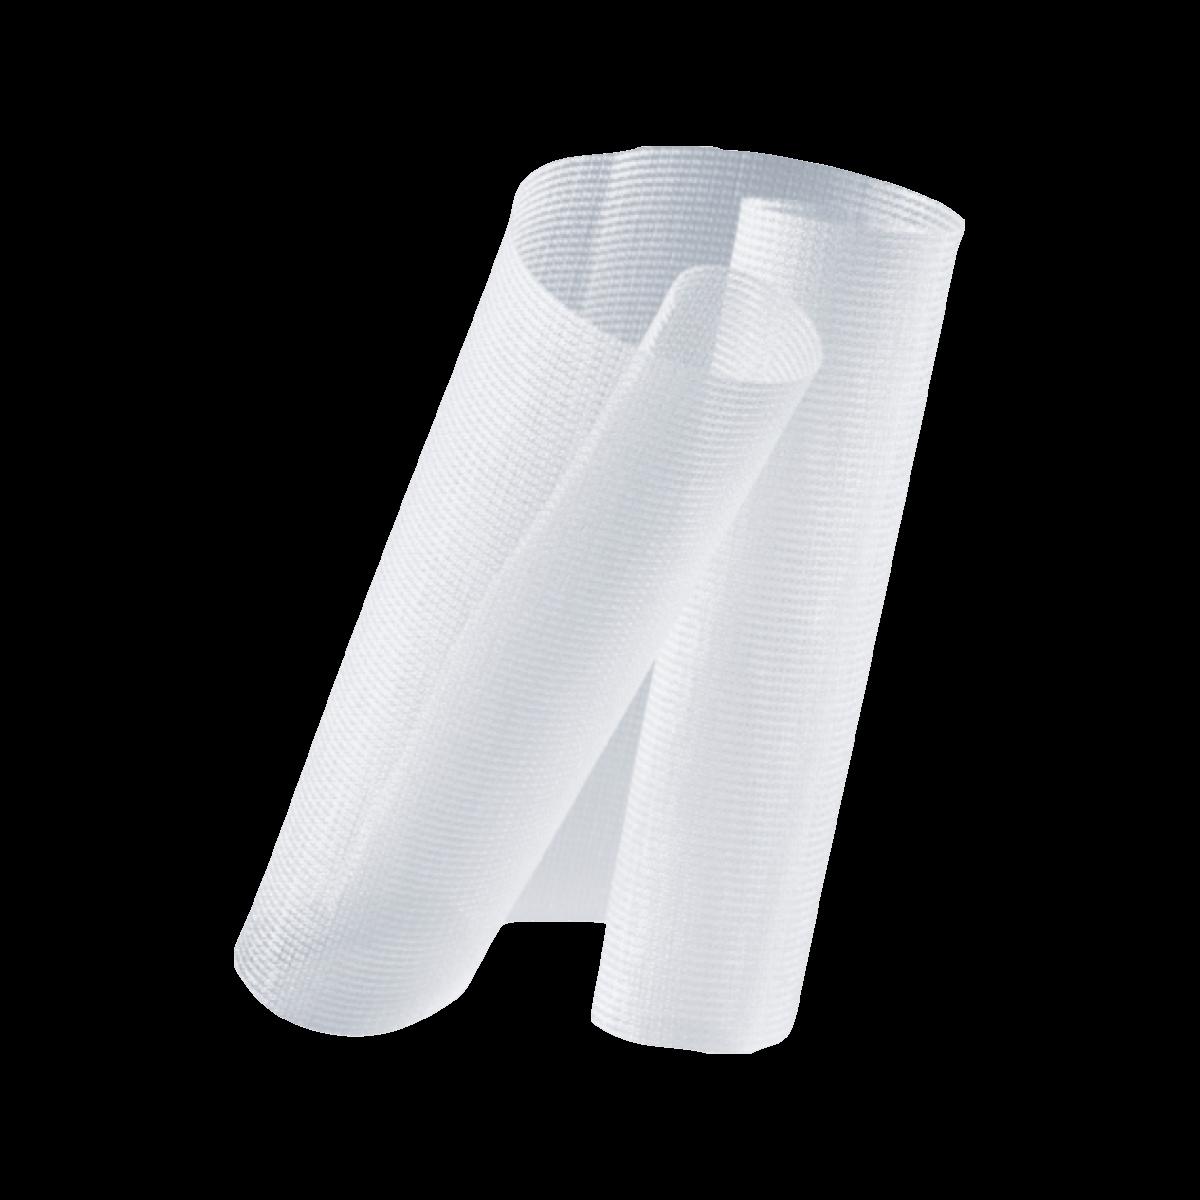 Tela Inorgânica de Polipropileno Marlex 10x15cm Waltex